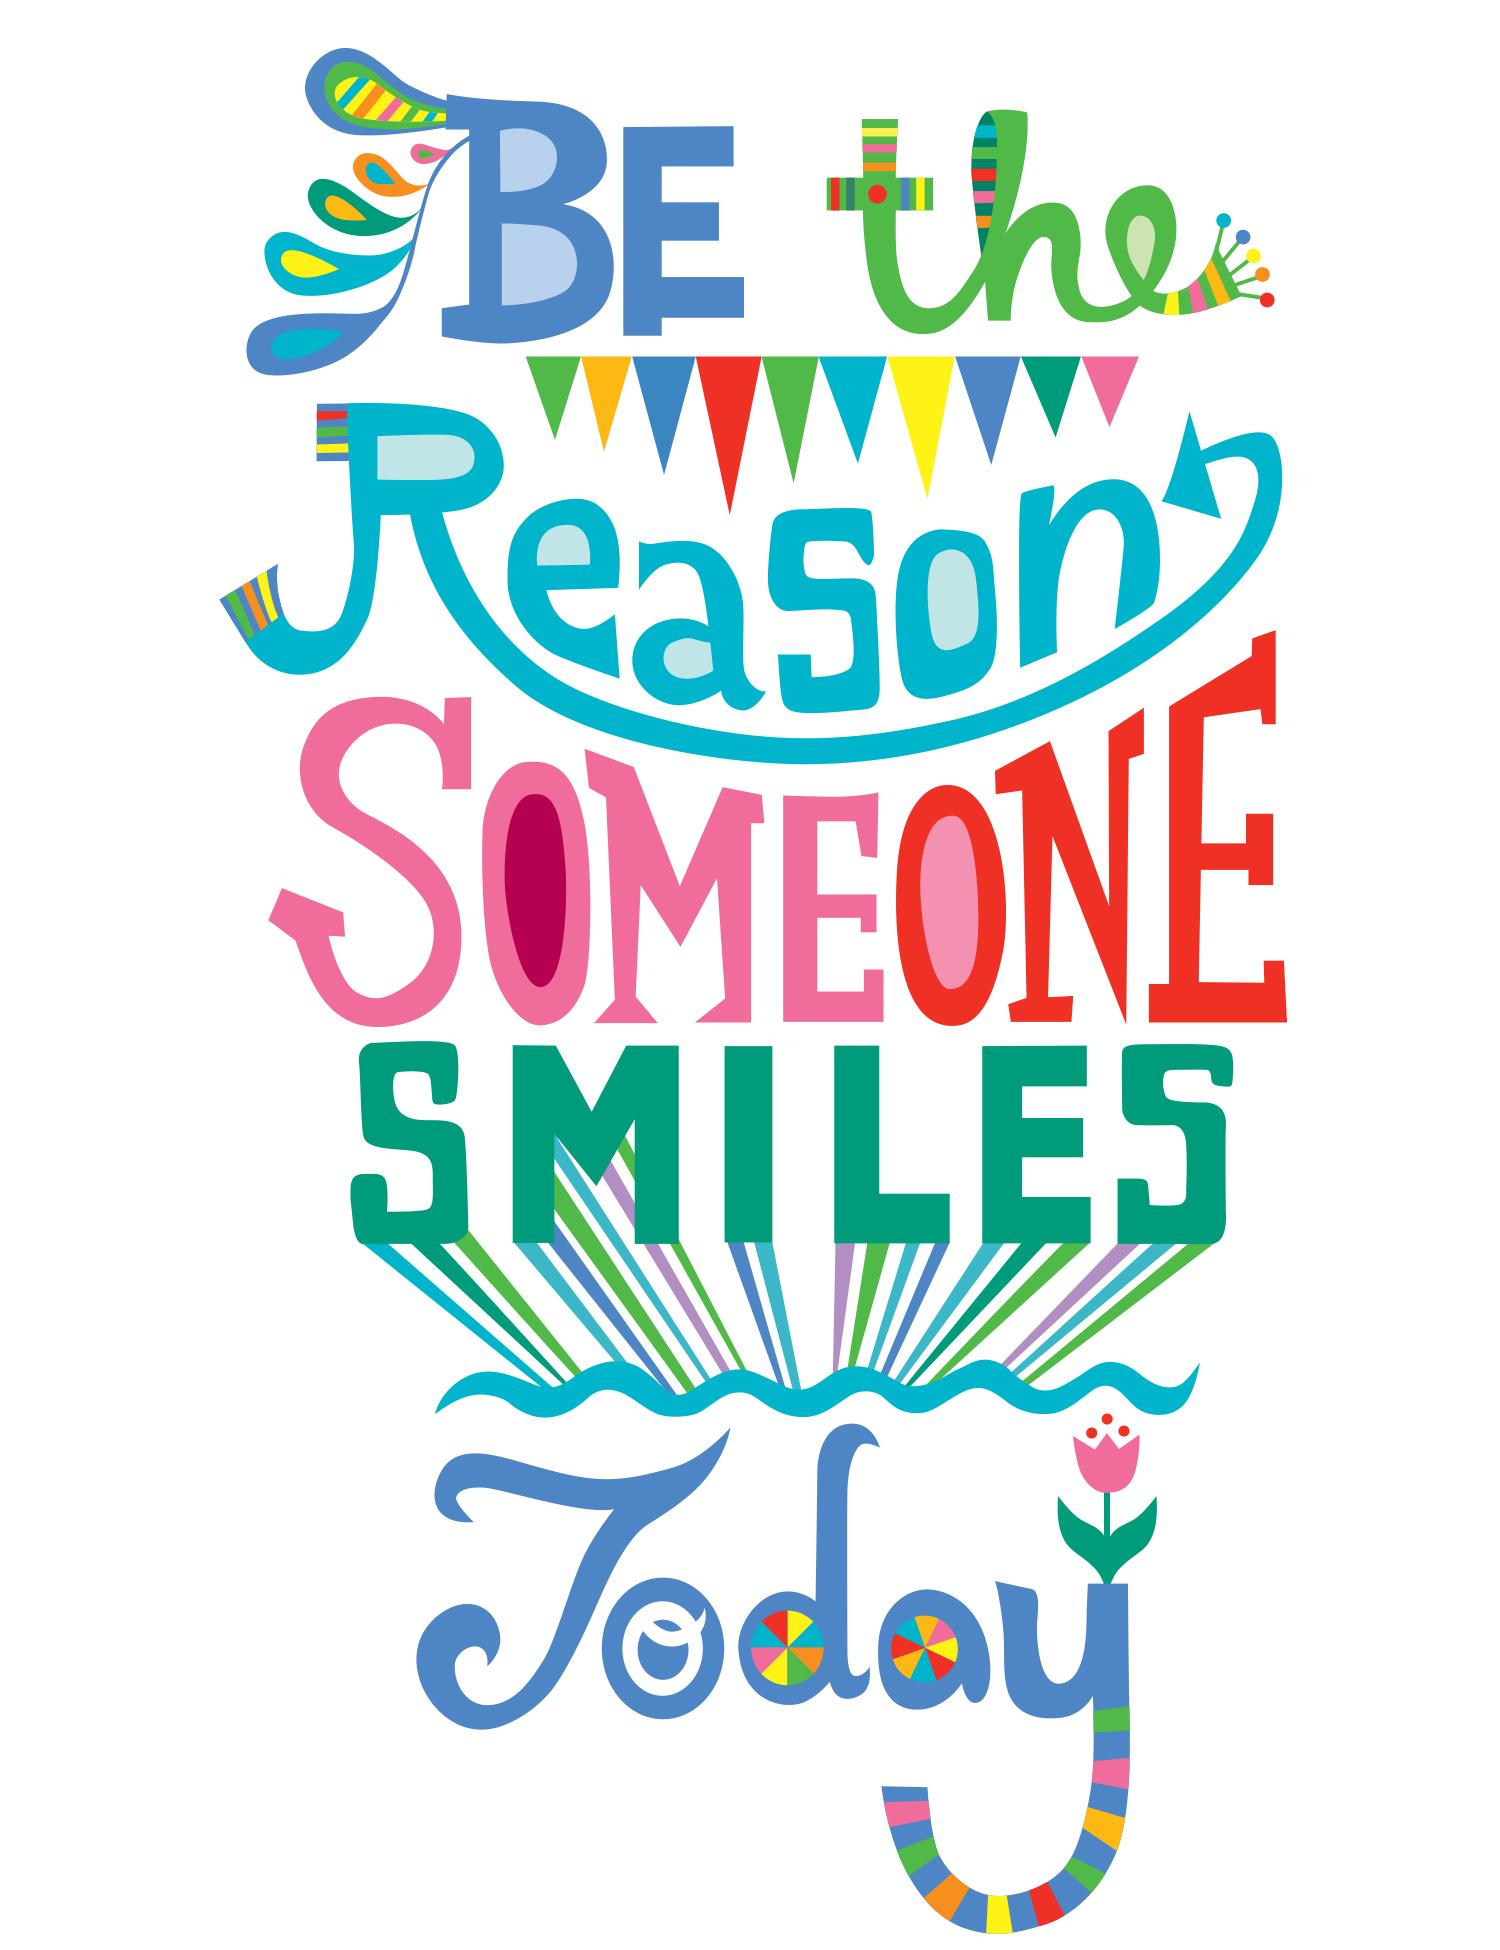 be_reason_someone_smiles_andi_bird.png